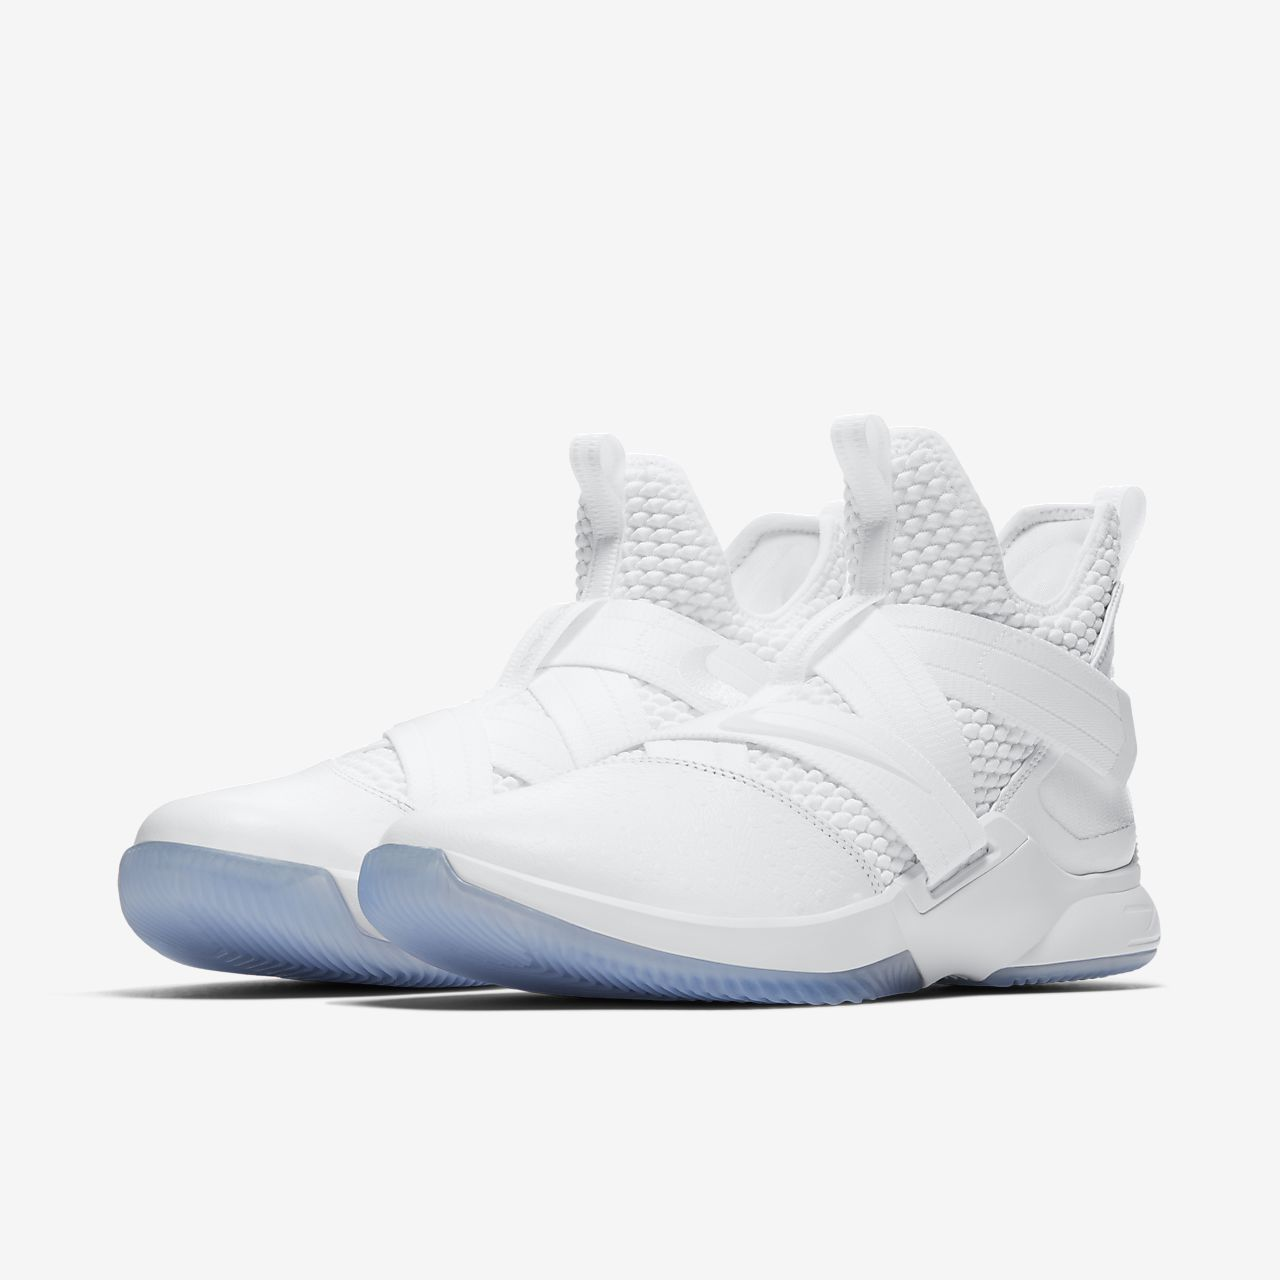 8b1302d4b6ca1 LeBron Soldier 12 SFG Basketball Shoe. Nike.com ZA